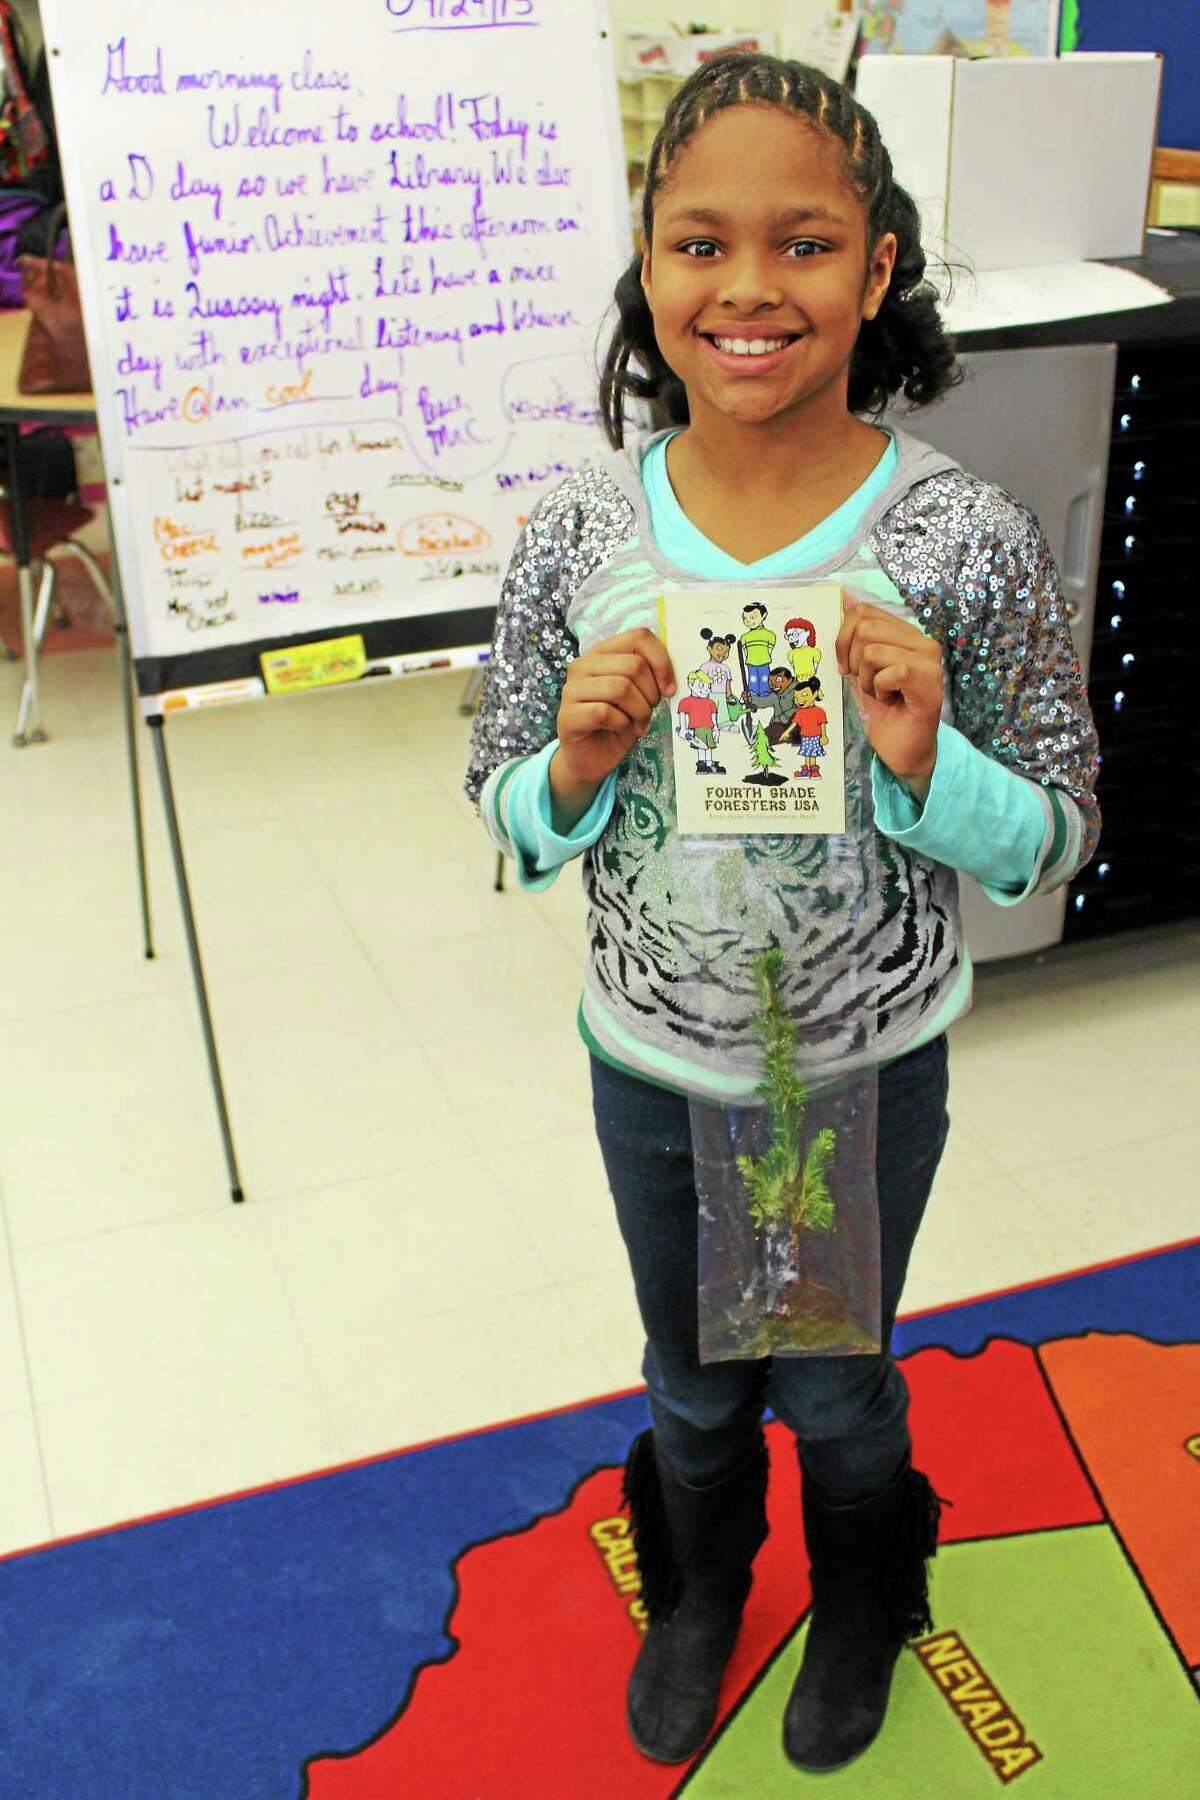 Student Jada Diaz with her pine tree sapling.